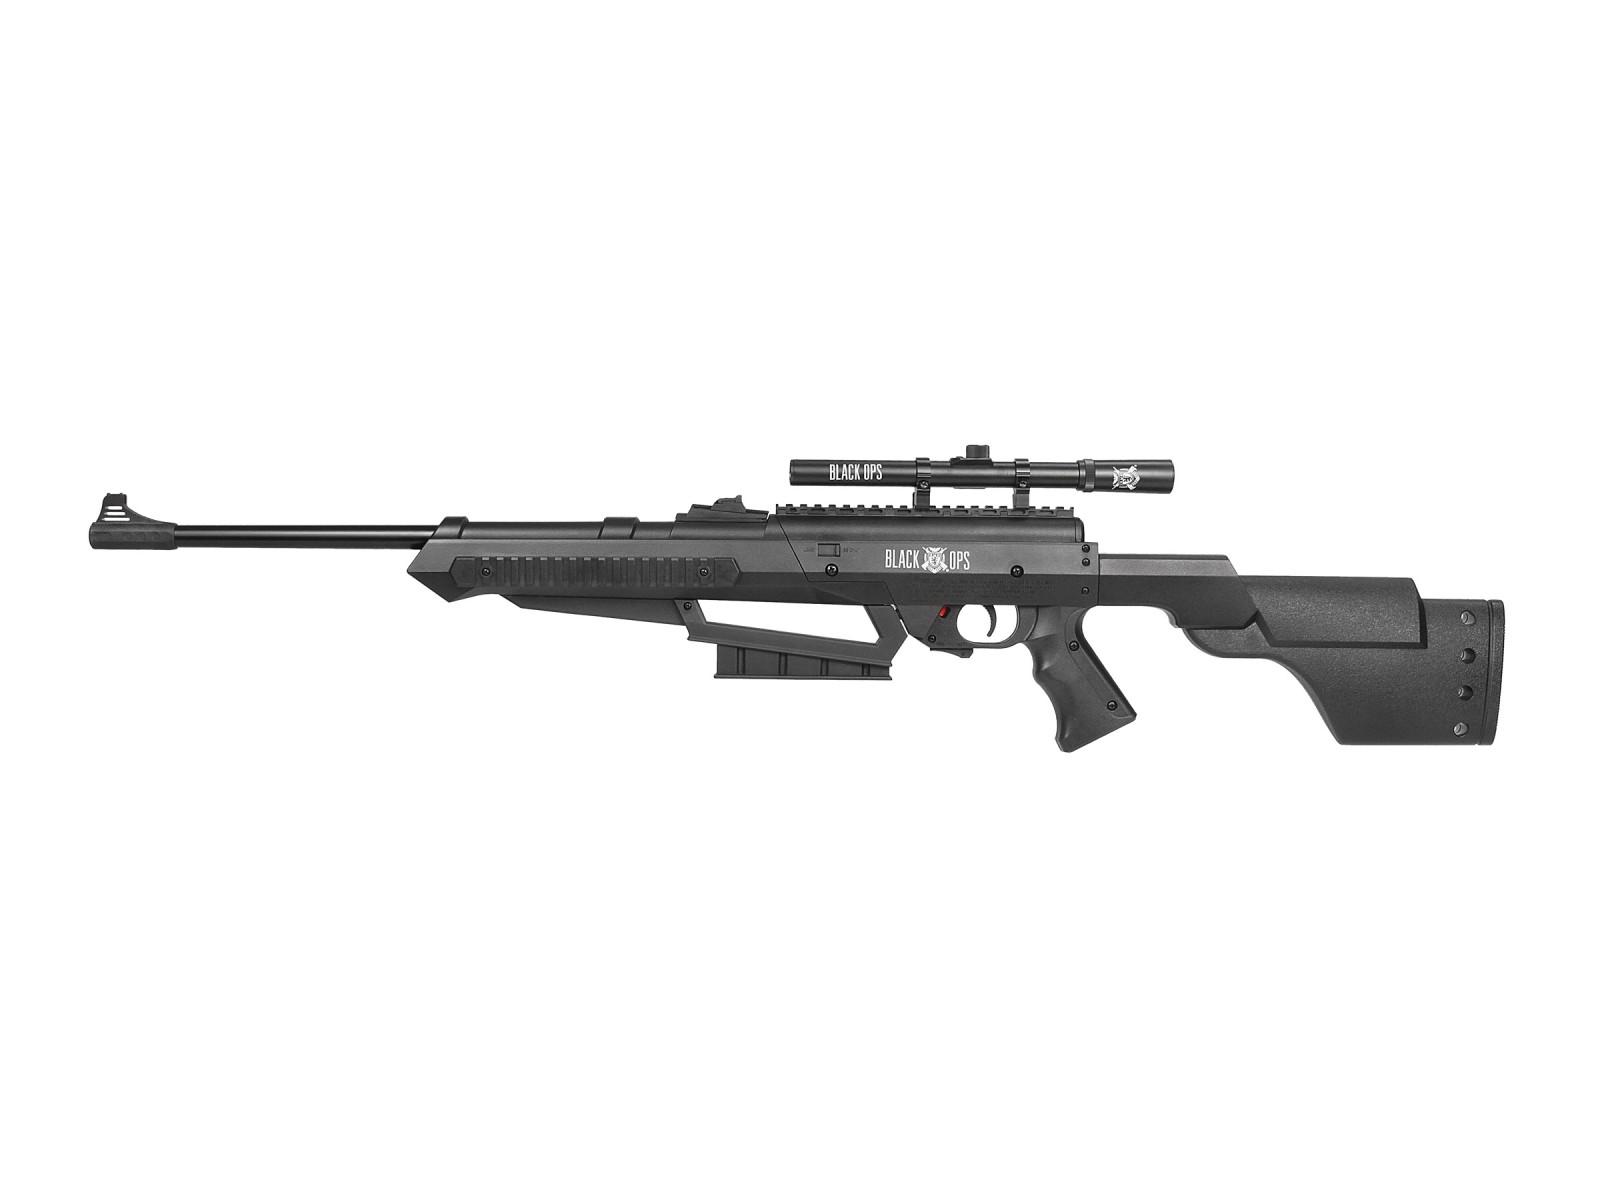 Black Ops Junior Sniper Air Rifle Combo - 0.177 cal - Multi-Pump 4x15 Scope BBs | eBay